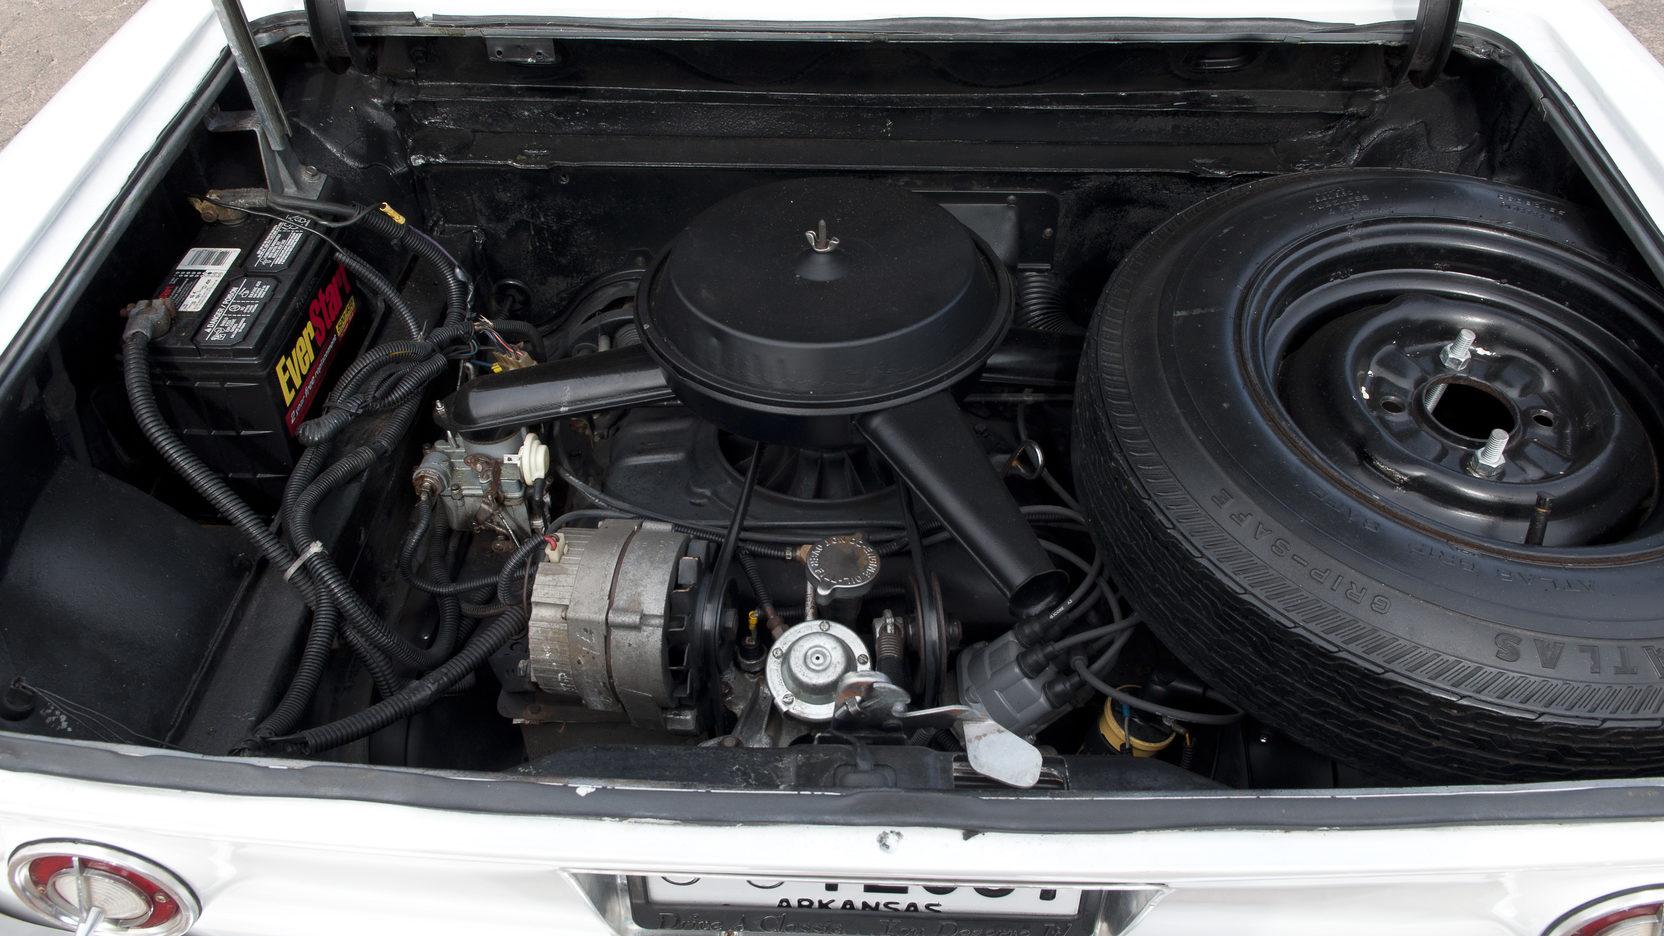 Chevrolet Corvair engine rear